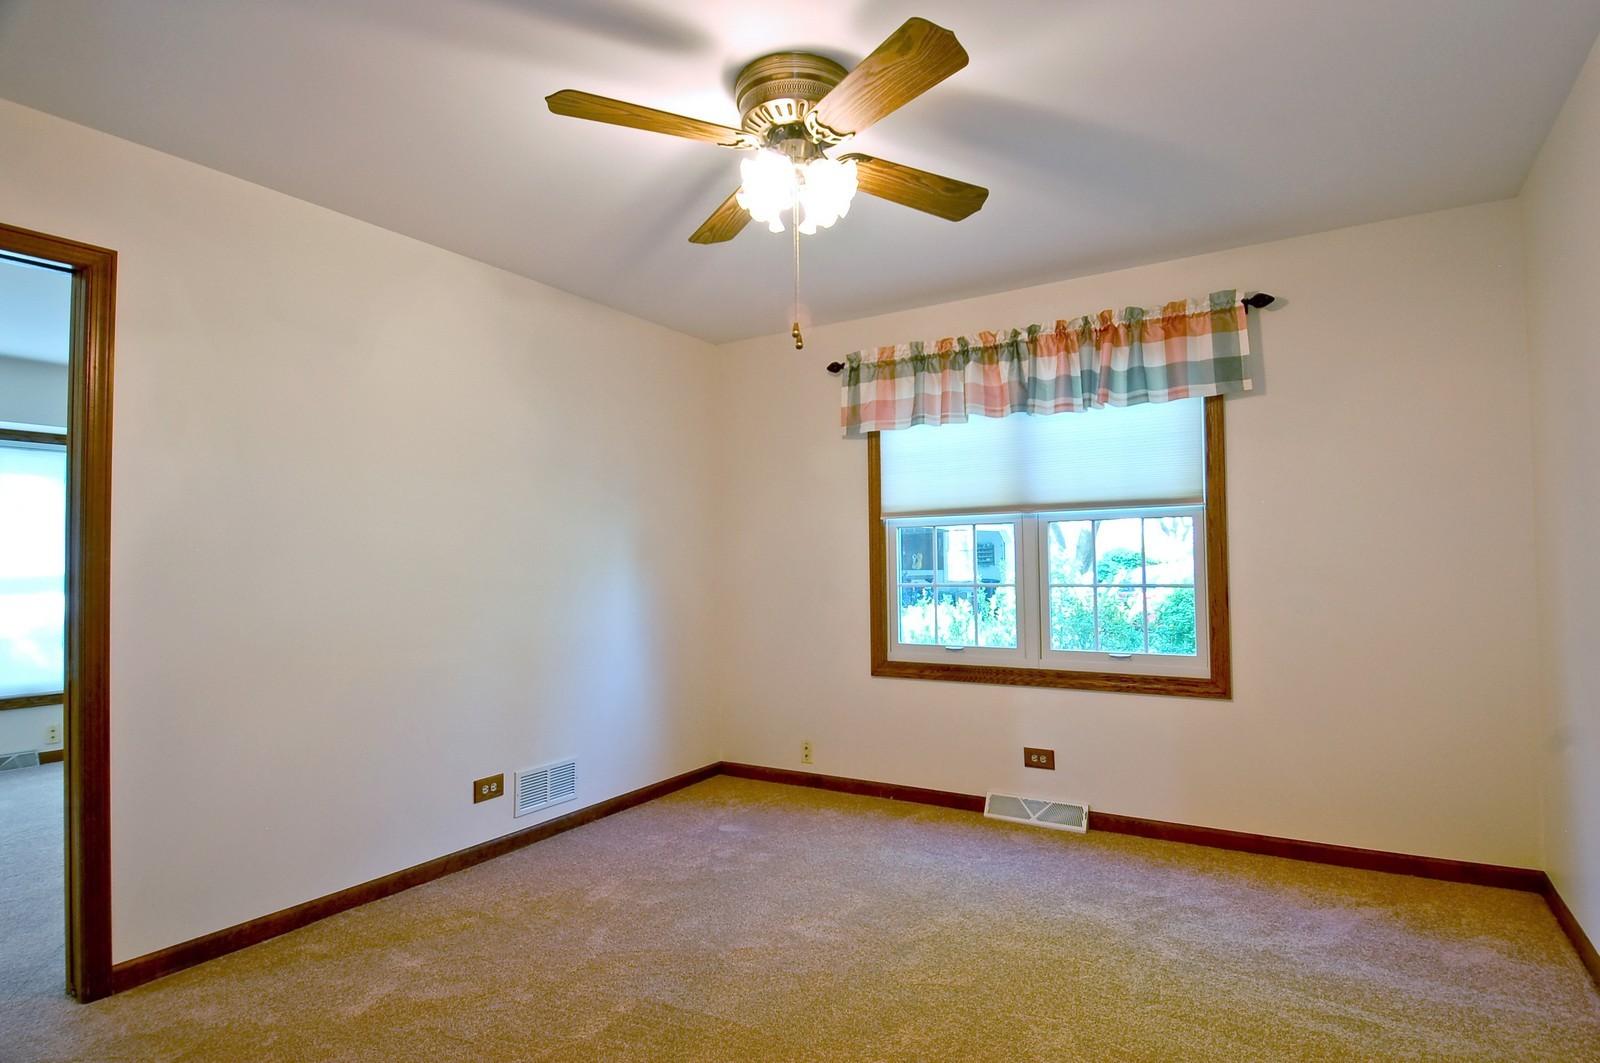 Real Estate Photography - 27W371 Churchill, Winfield, IL, 60190 - Location 3